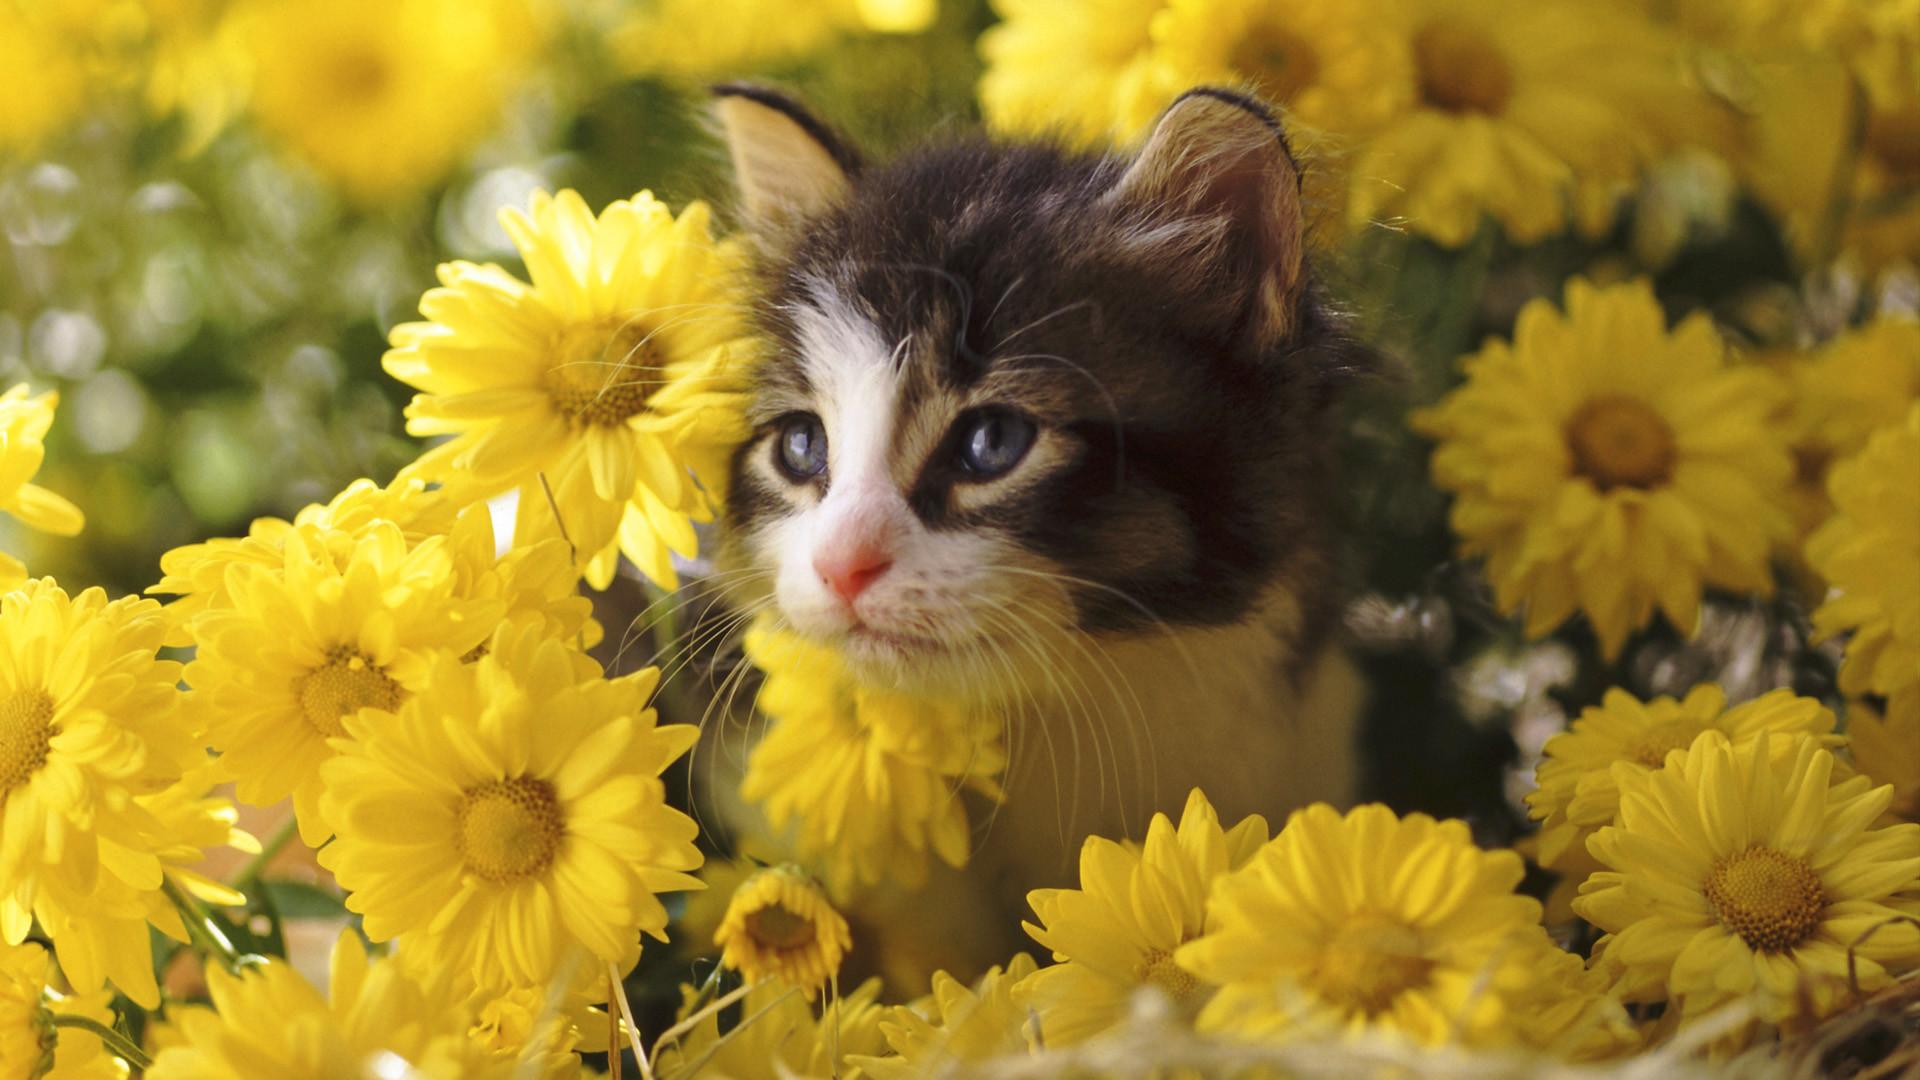 Kitten Among Mums